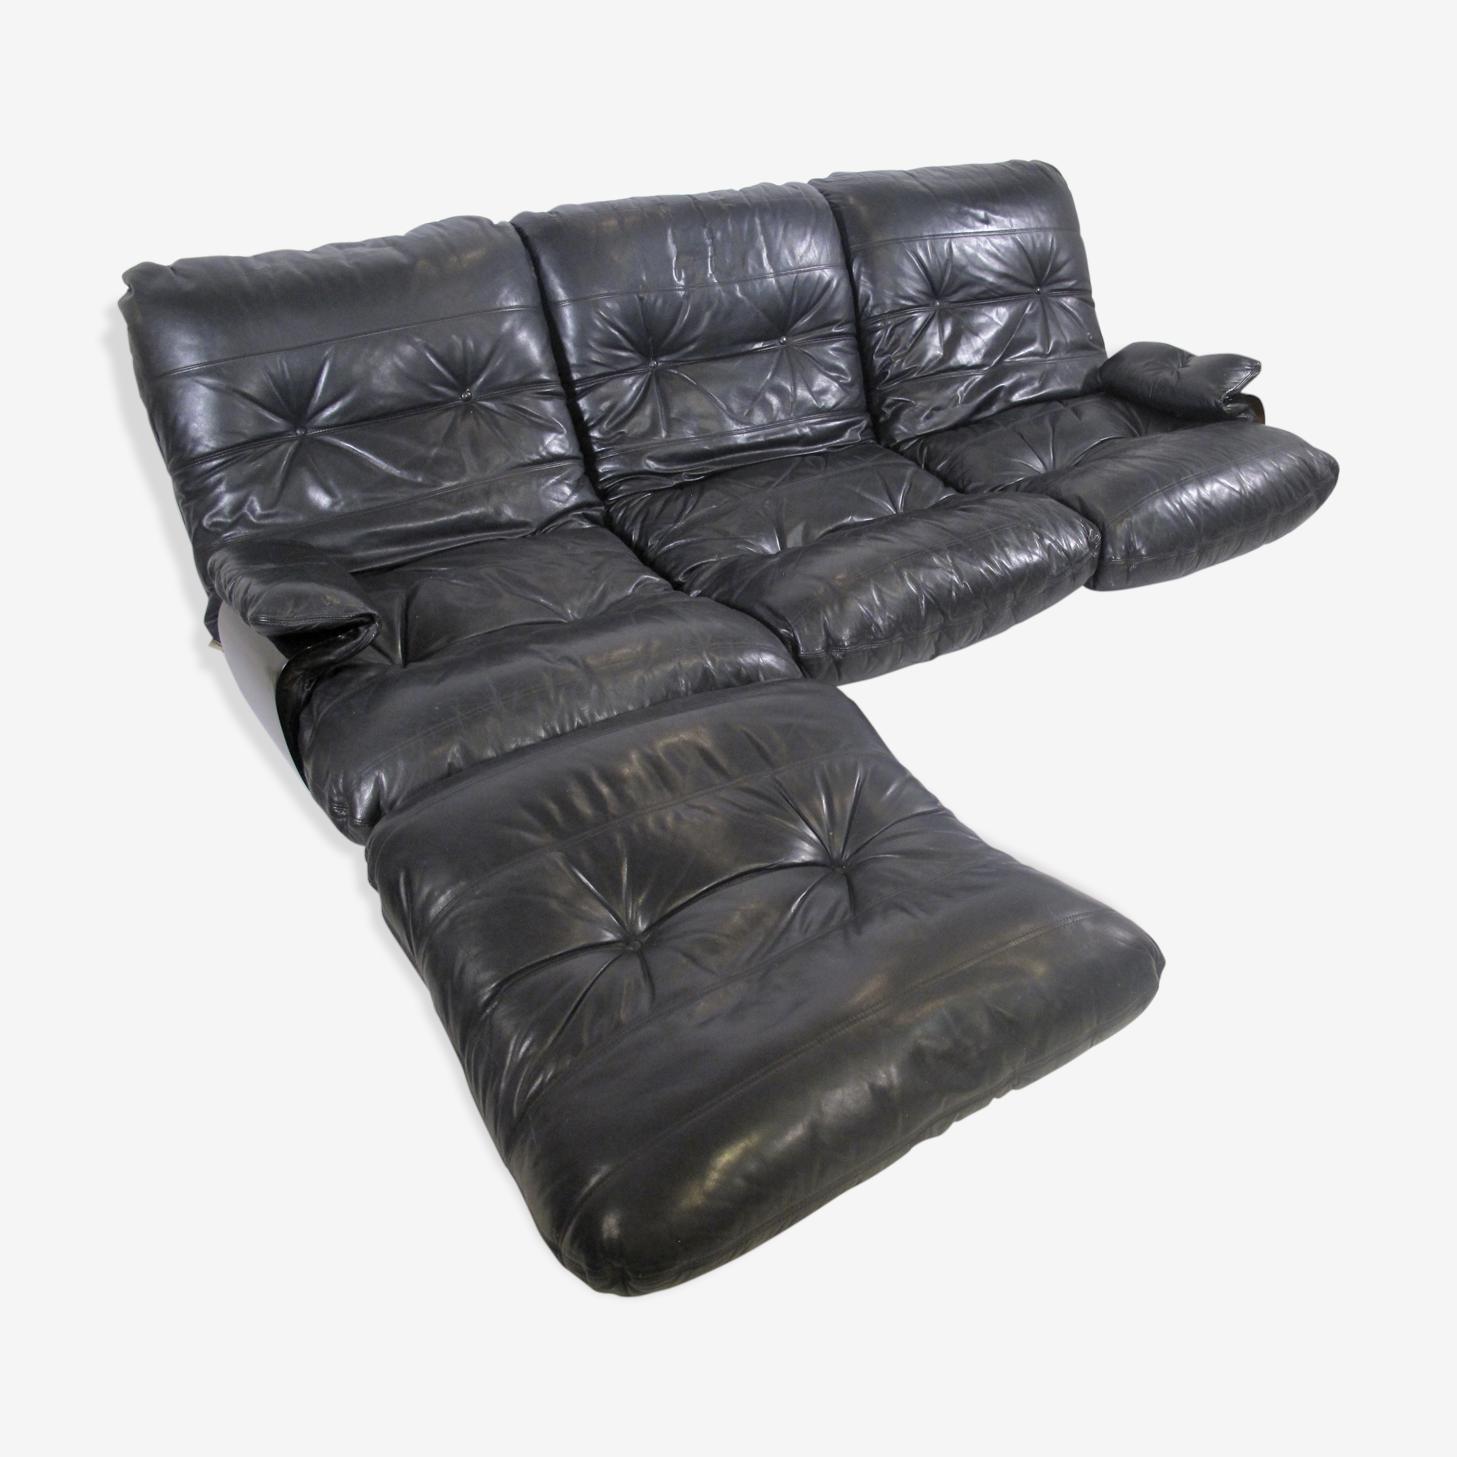 "Sofa leather and ottoman ""Marsala"", Ligne Roset, France 1970"